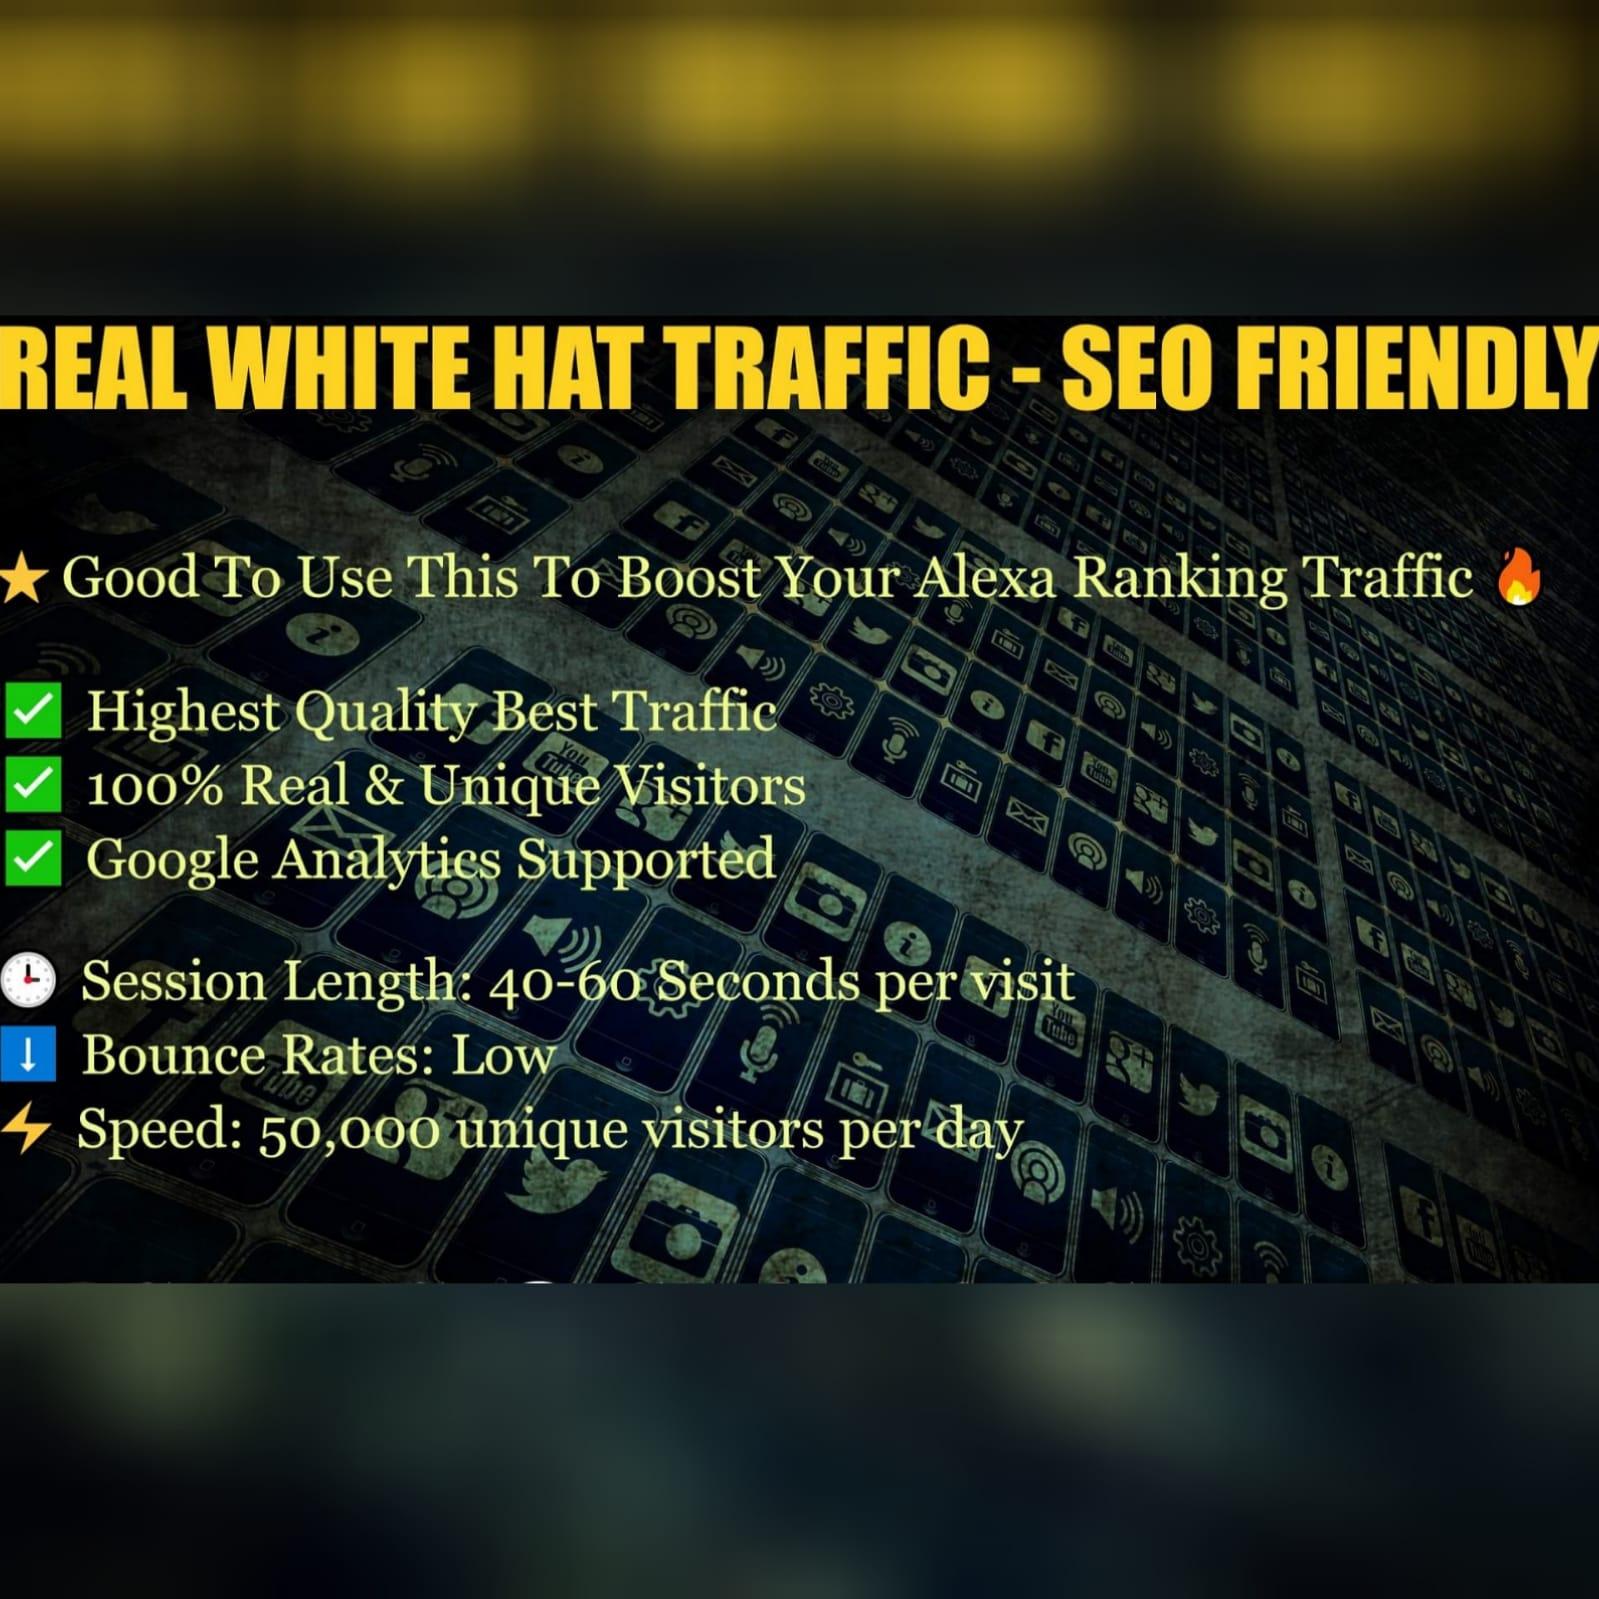 Real White Traffic - Google / Alexa / Platforms - SEO FRIENDLY 1k per order